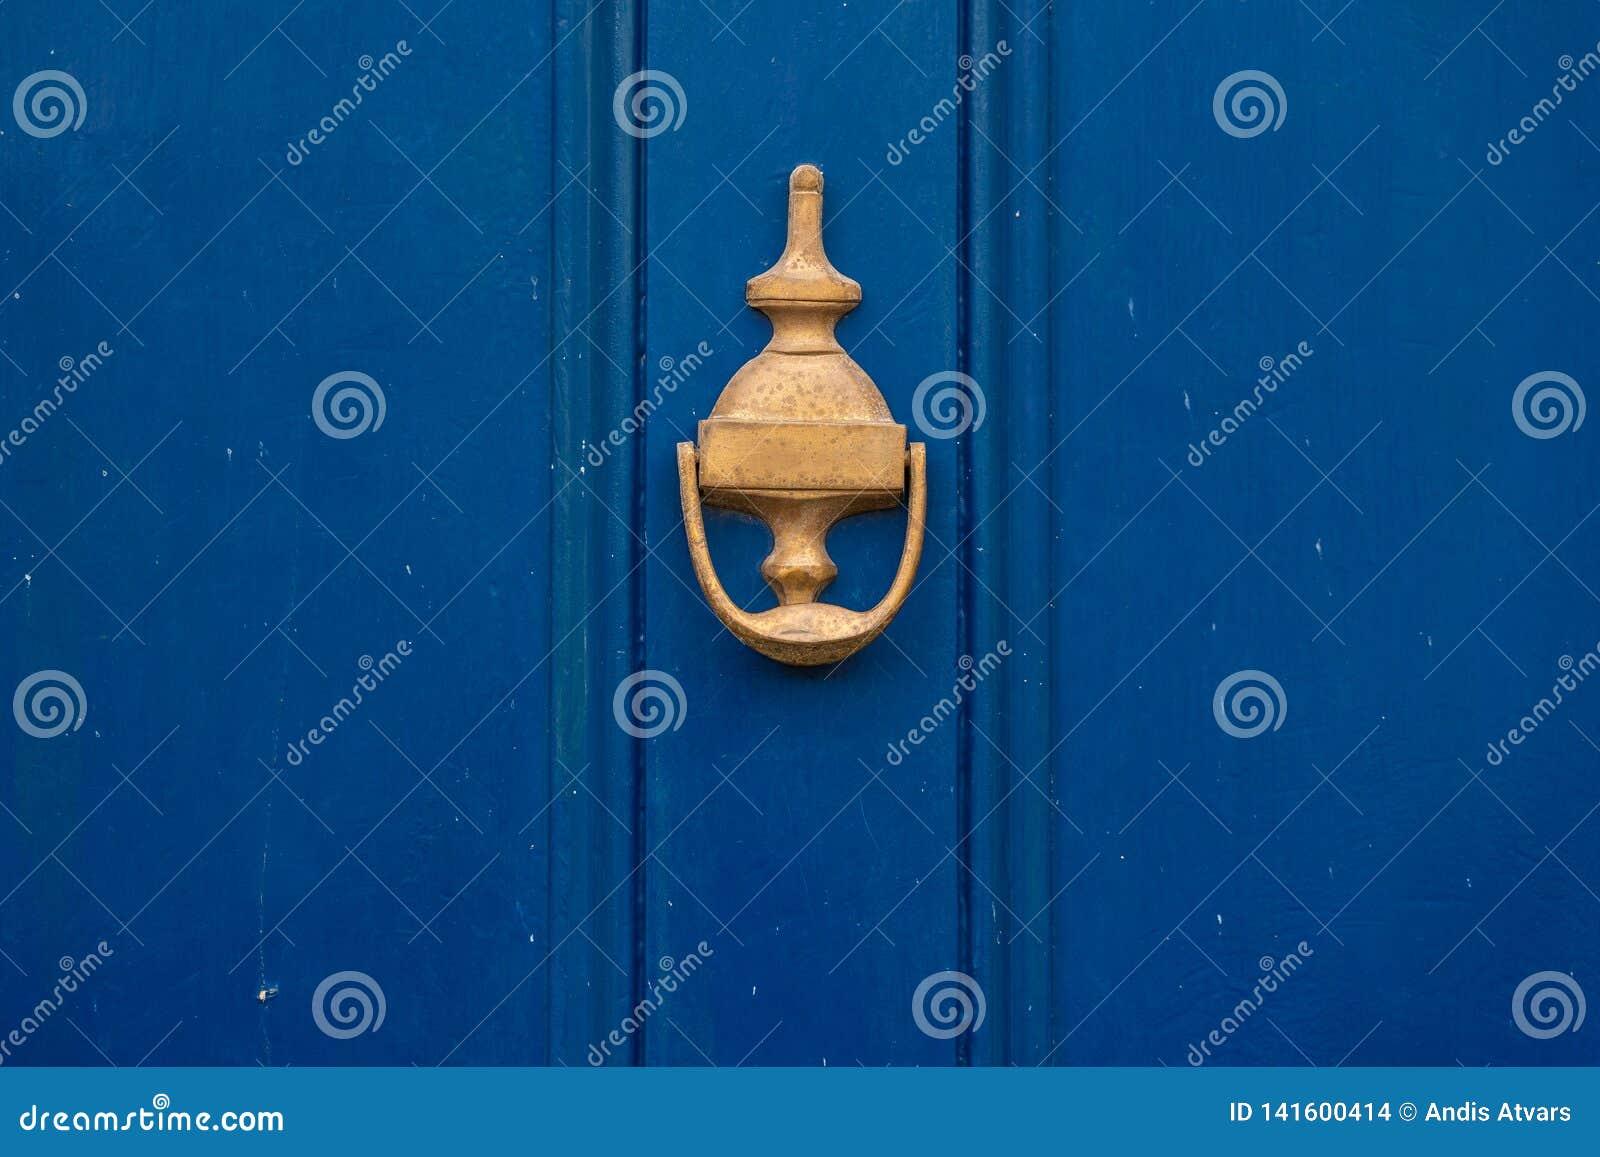 De achtergrond van uitstekende blauwe geschilderde deur en kloppersvignet kijkt die van ouderwets uitstekend messingsmetaal wordt